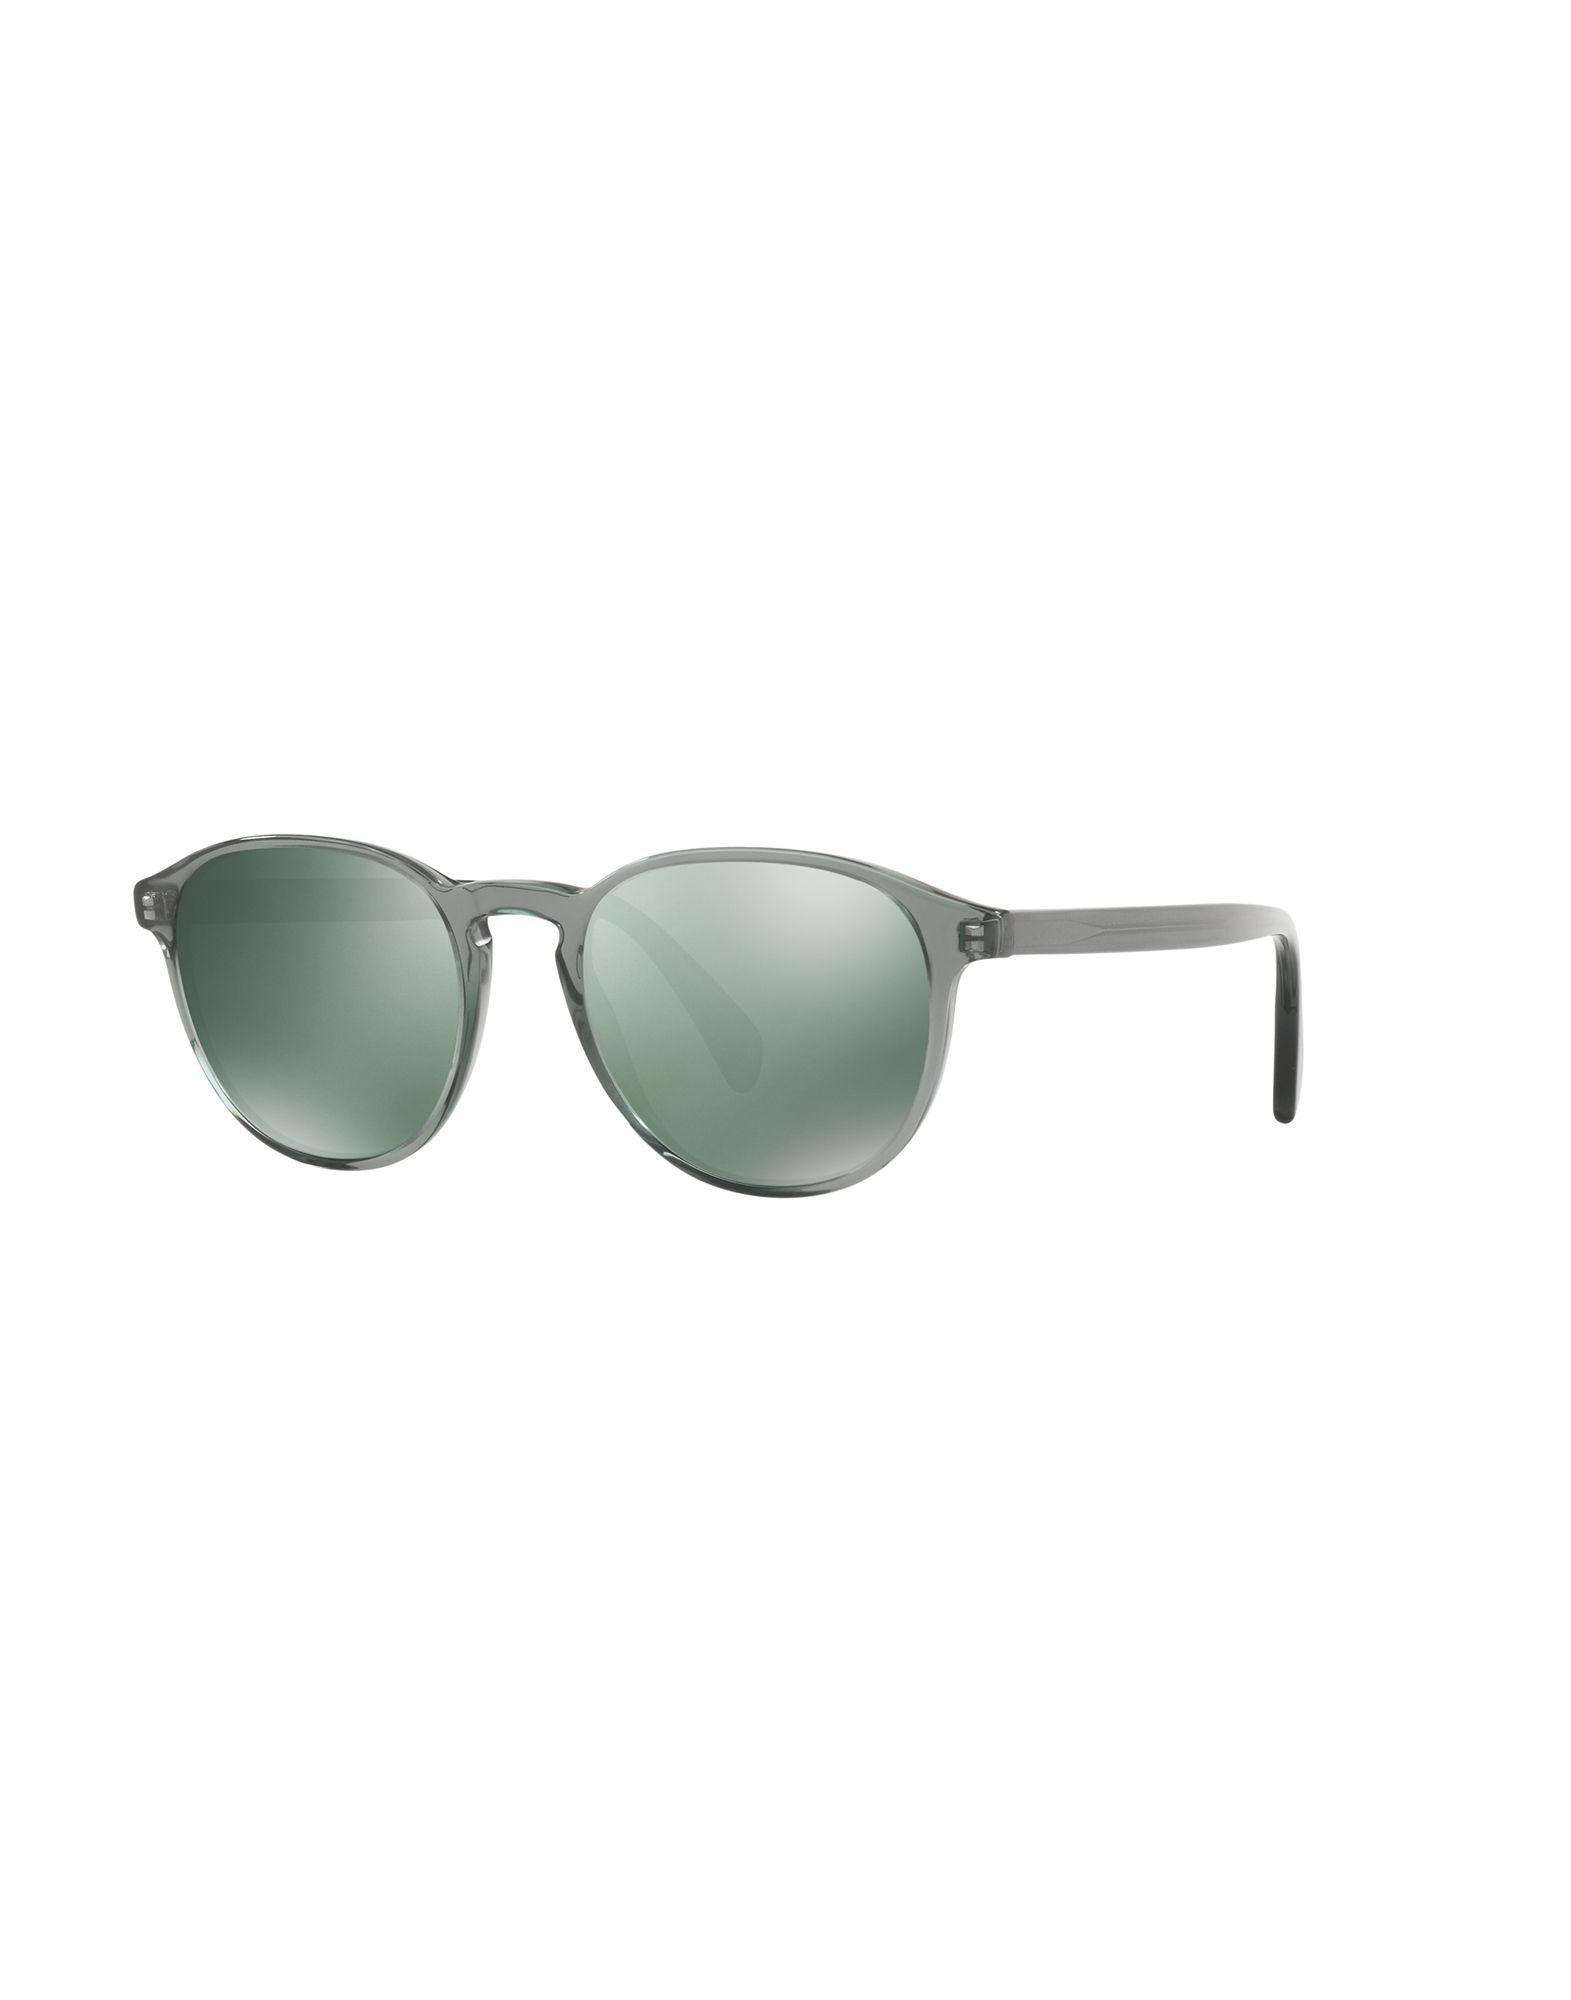 PAUL SMITH Солнечные очки солцезащитные очки